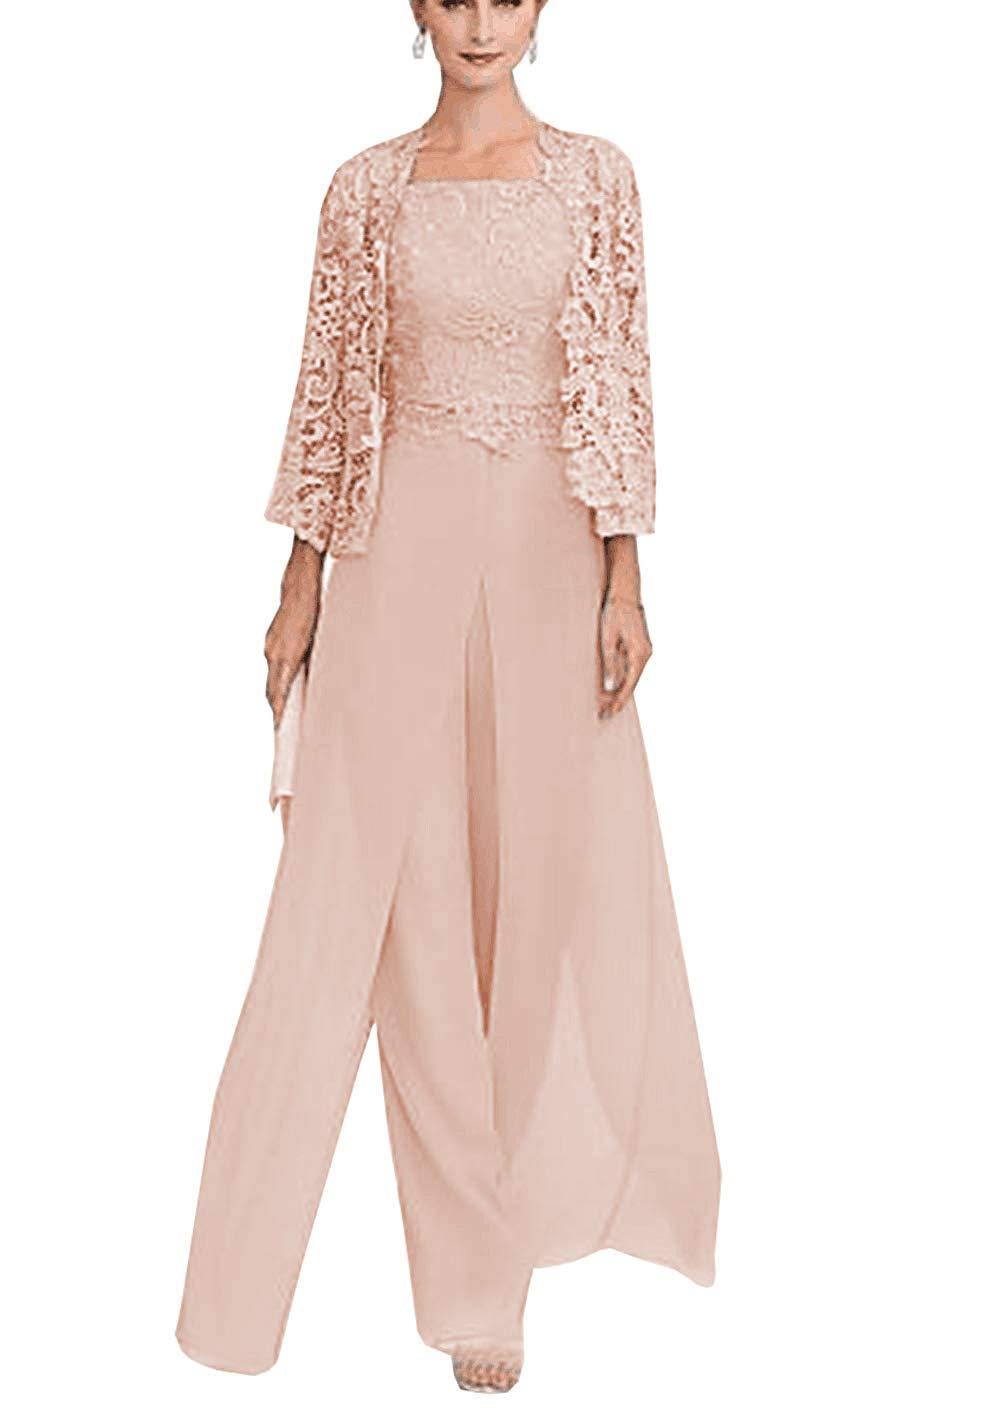 Women's Mother of Bride Groom Dress Pant Suits 3 Pieces ...